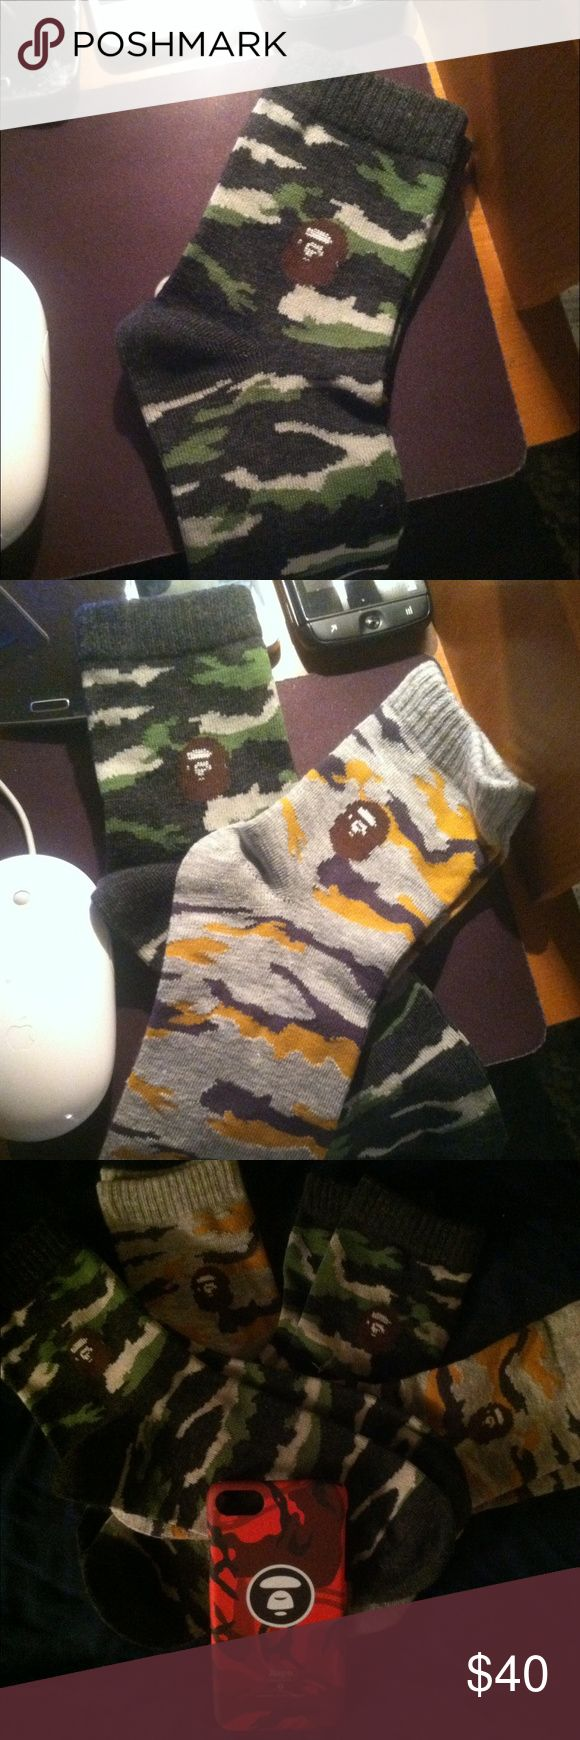 Tiger camo Bape socks by A Bathing Ape Green grey camo Bape Socks by A Bathing Ape Bape A bathing Ape Accessories Hosiery & Socks